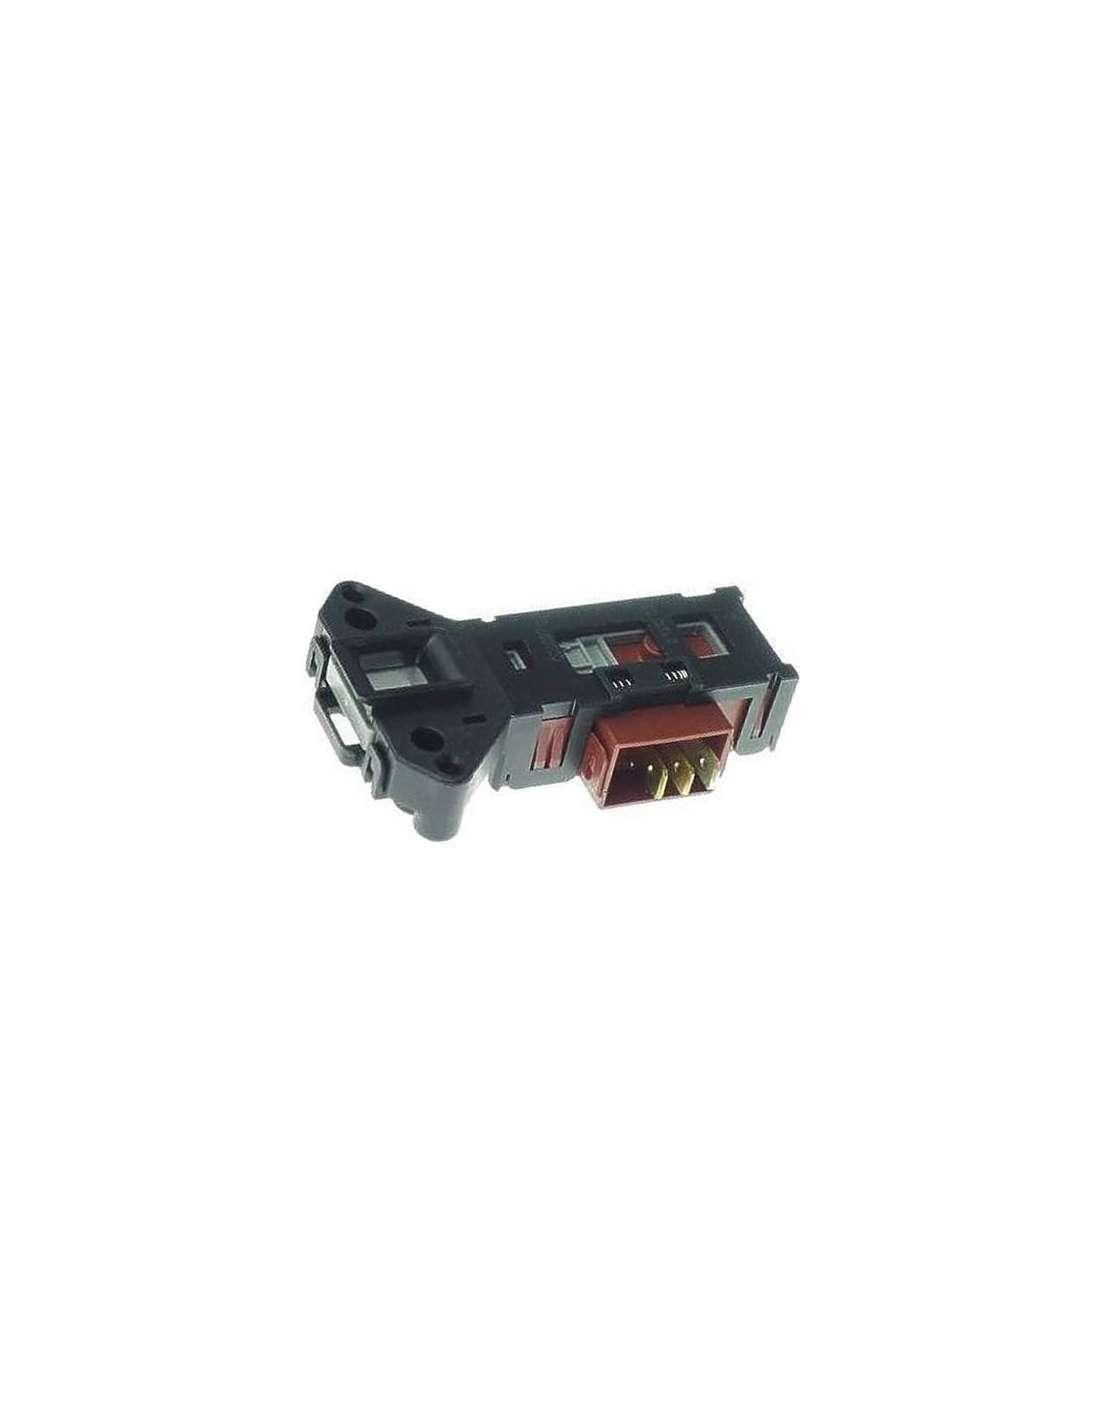 Termo electrico ariston simat80 barato 80 litros termo - Termo electrico ariston ...